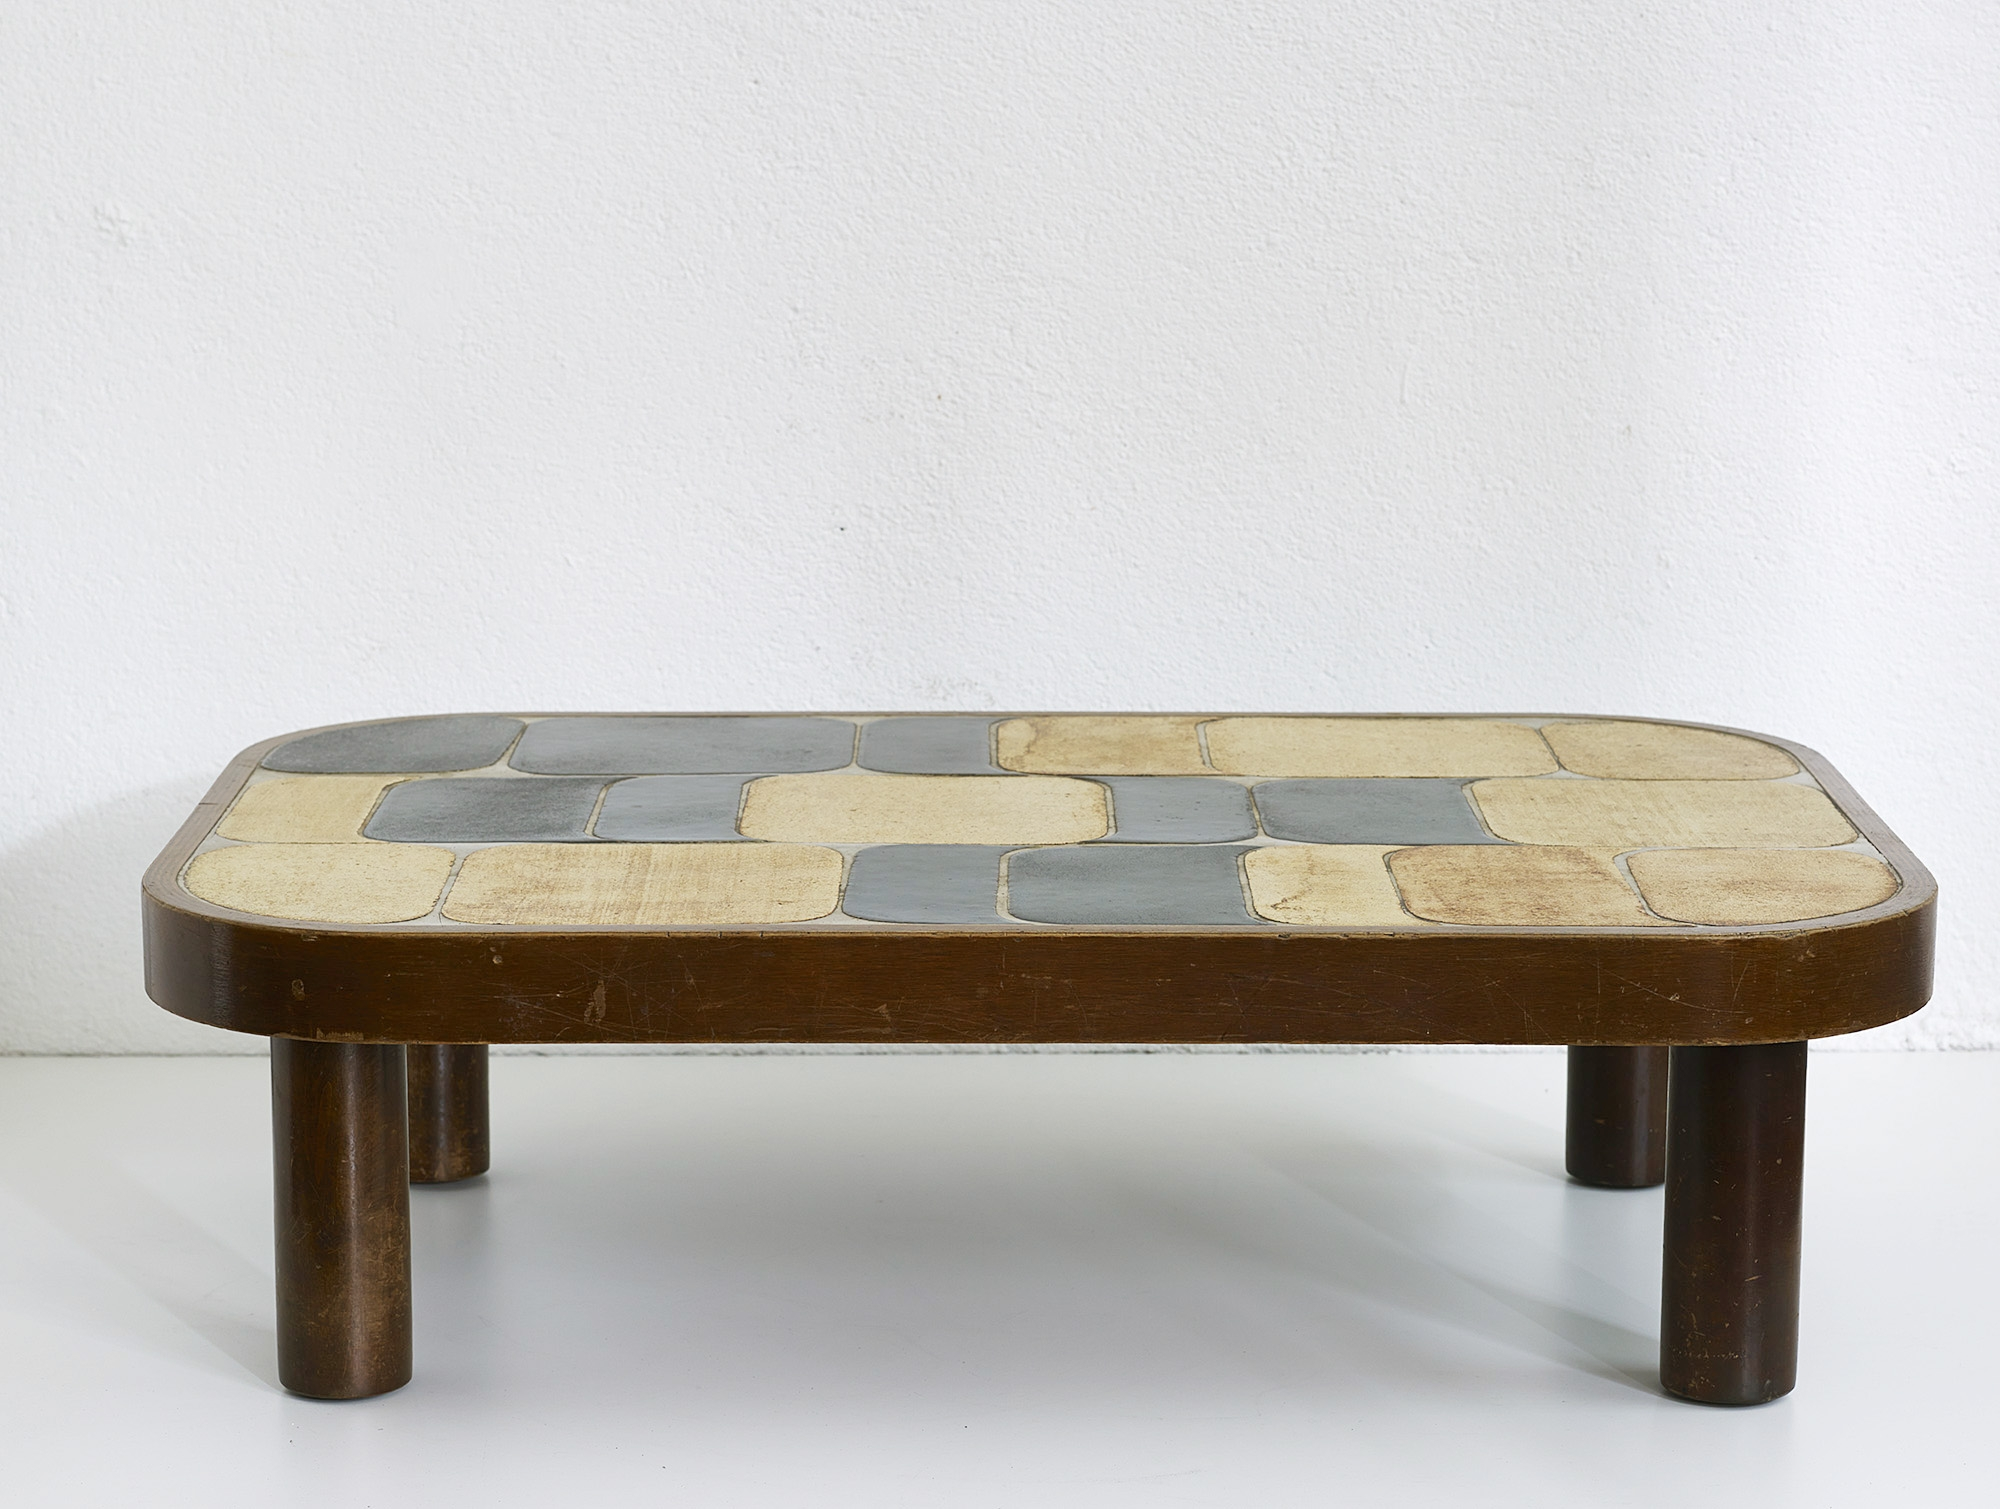 Table Basse Shogun De Roger Capron Espacemoderne